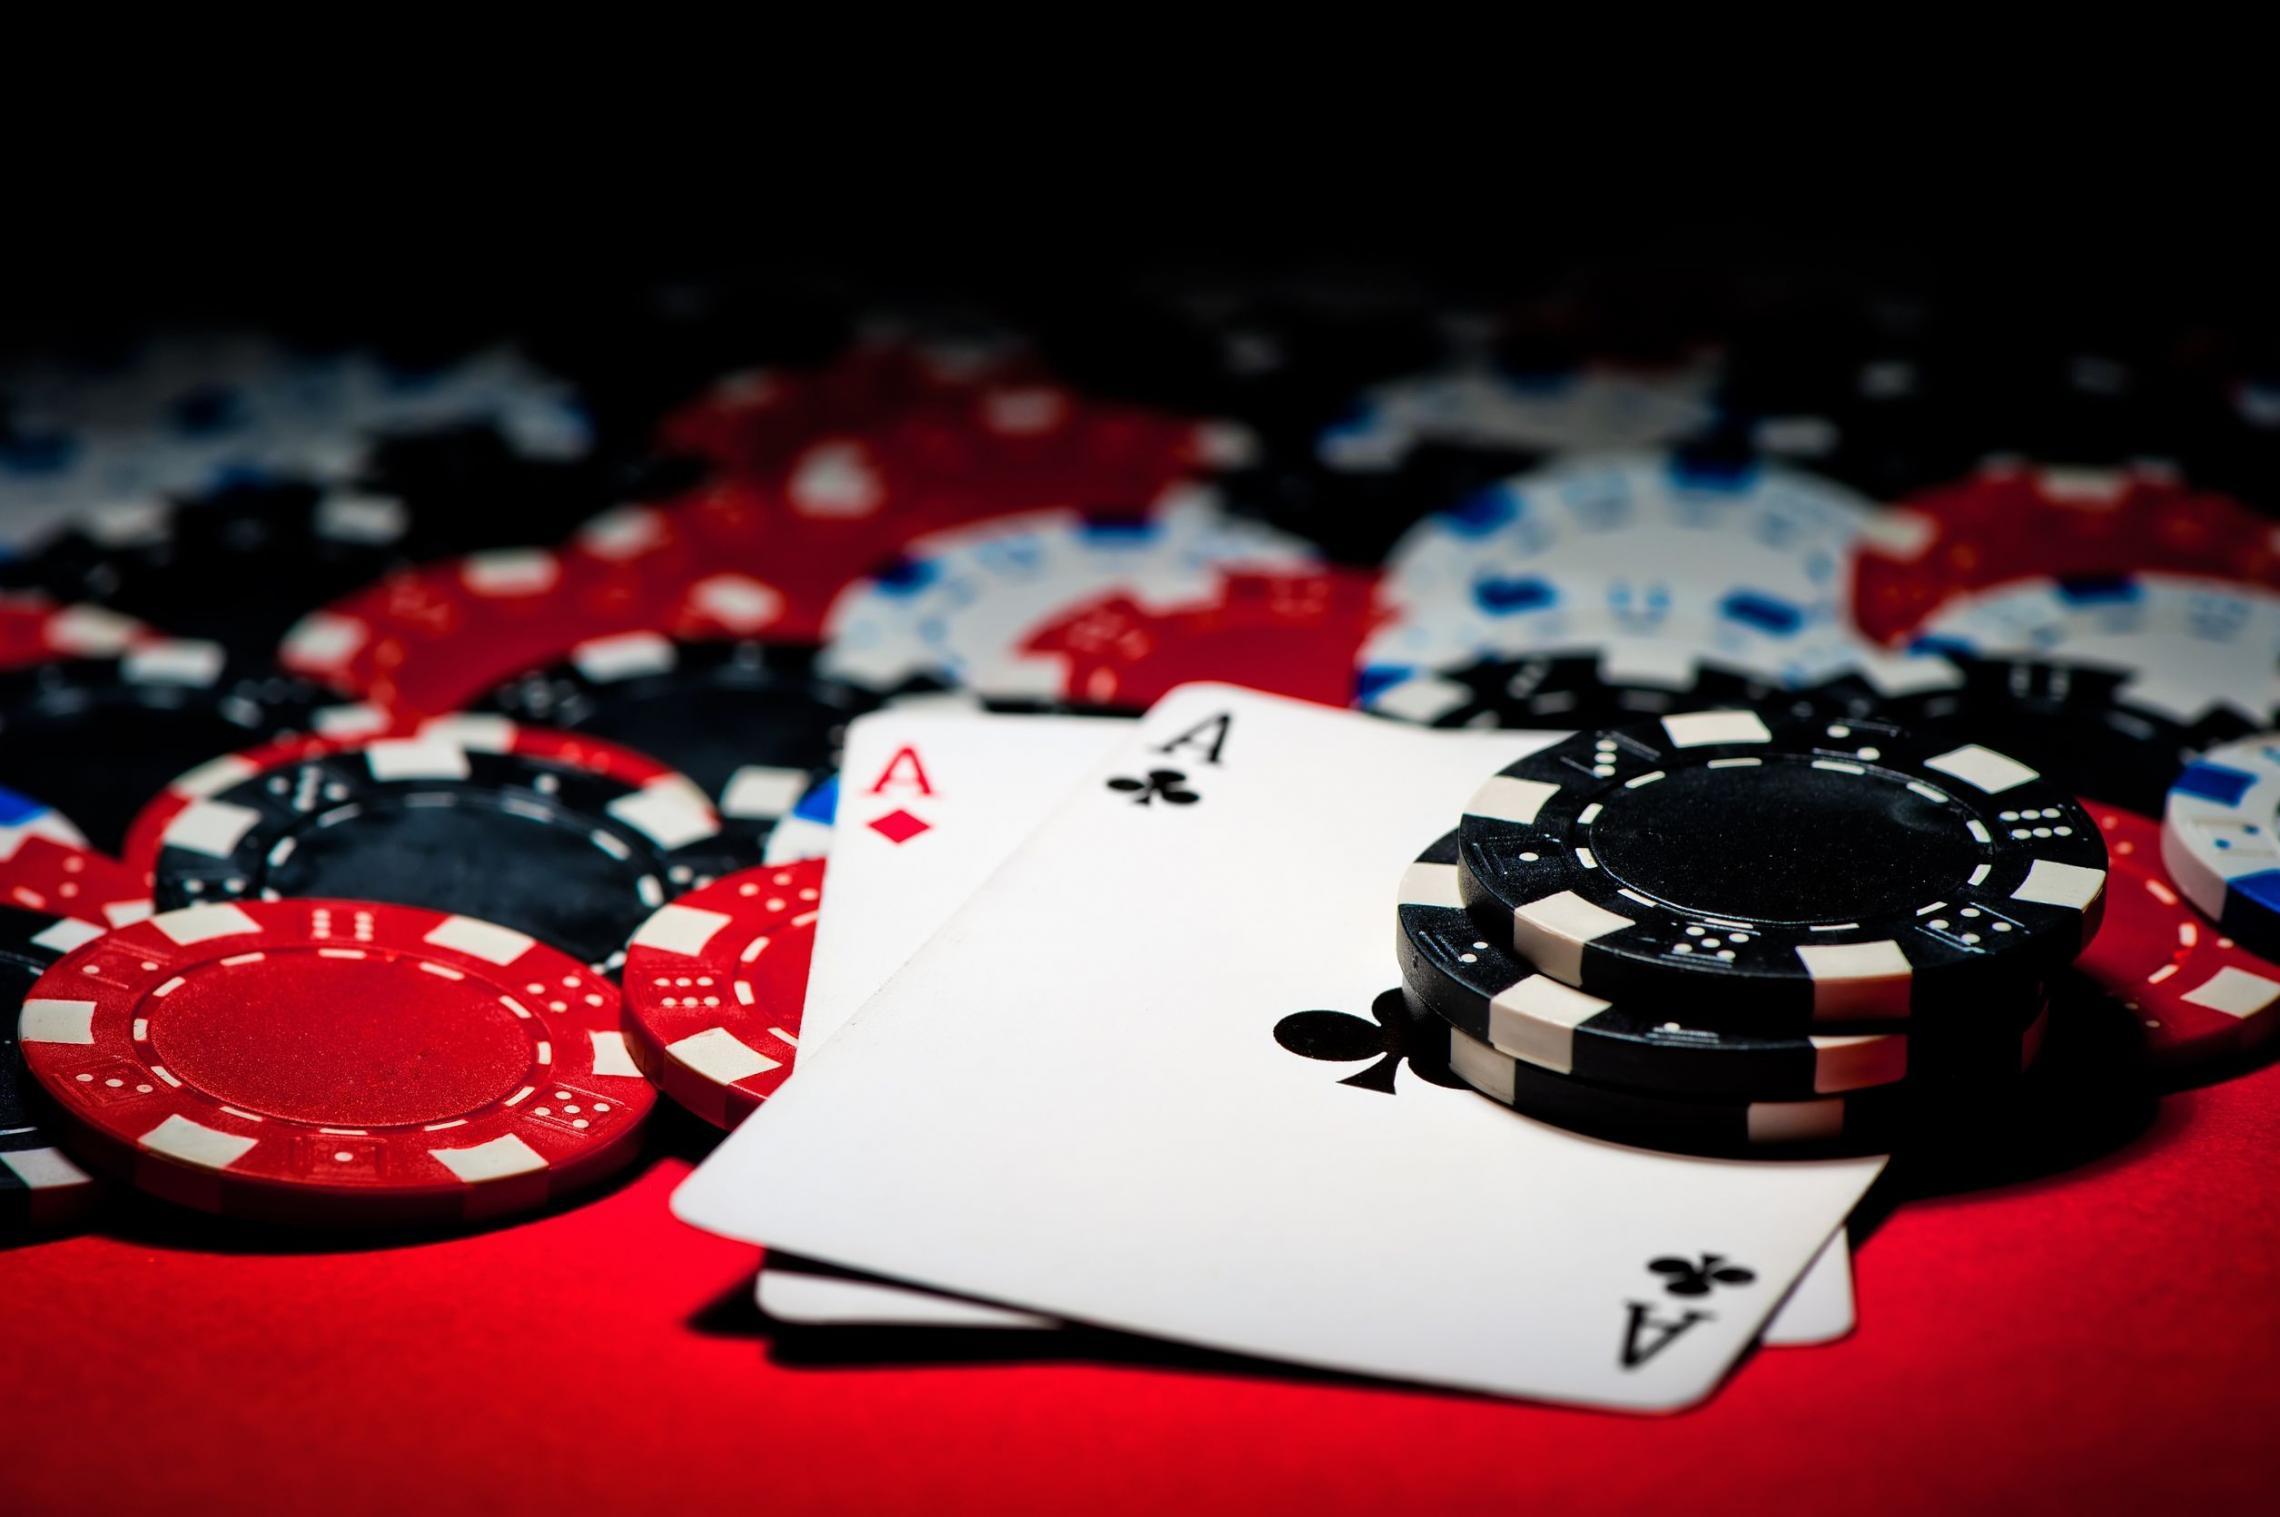 Покер HD Обои | Фон | 2511x1671 - Wallpaper Abyss